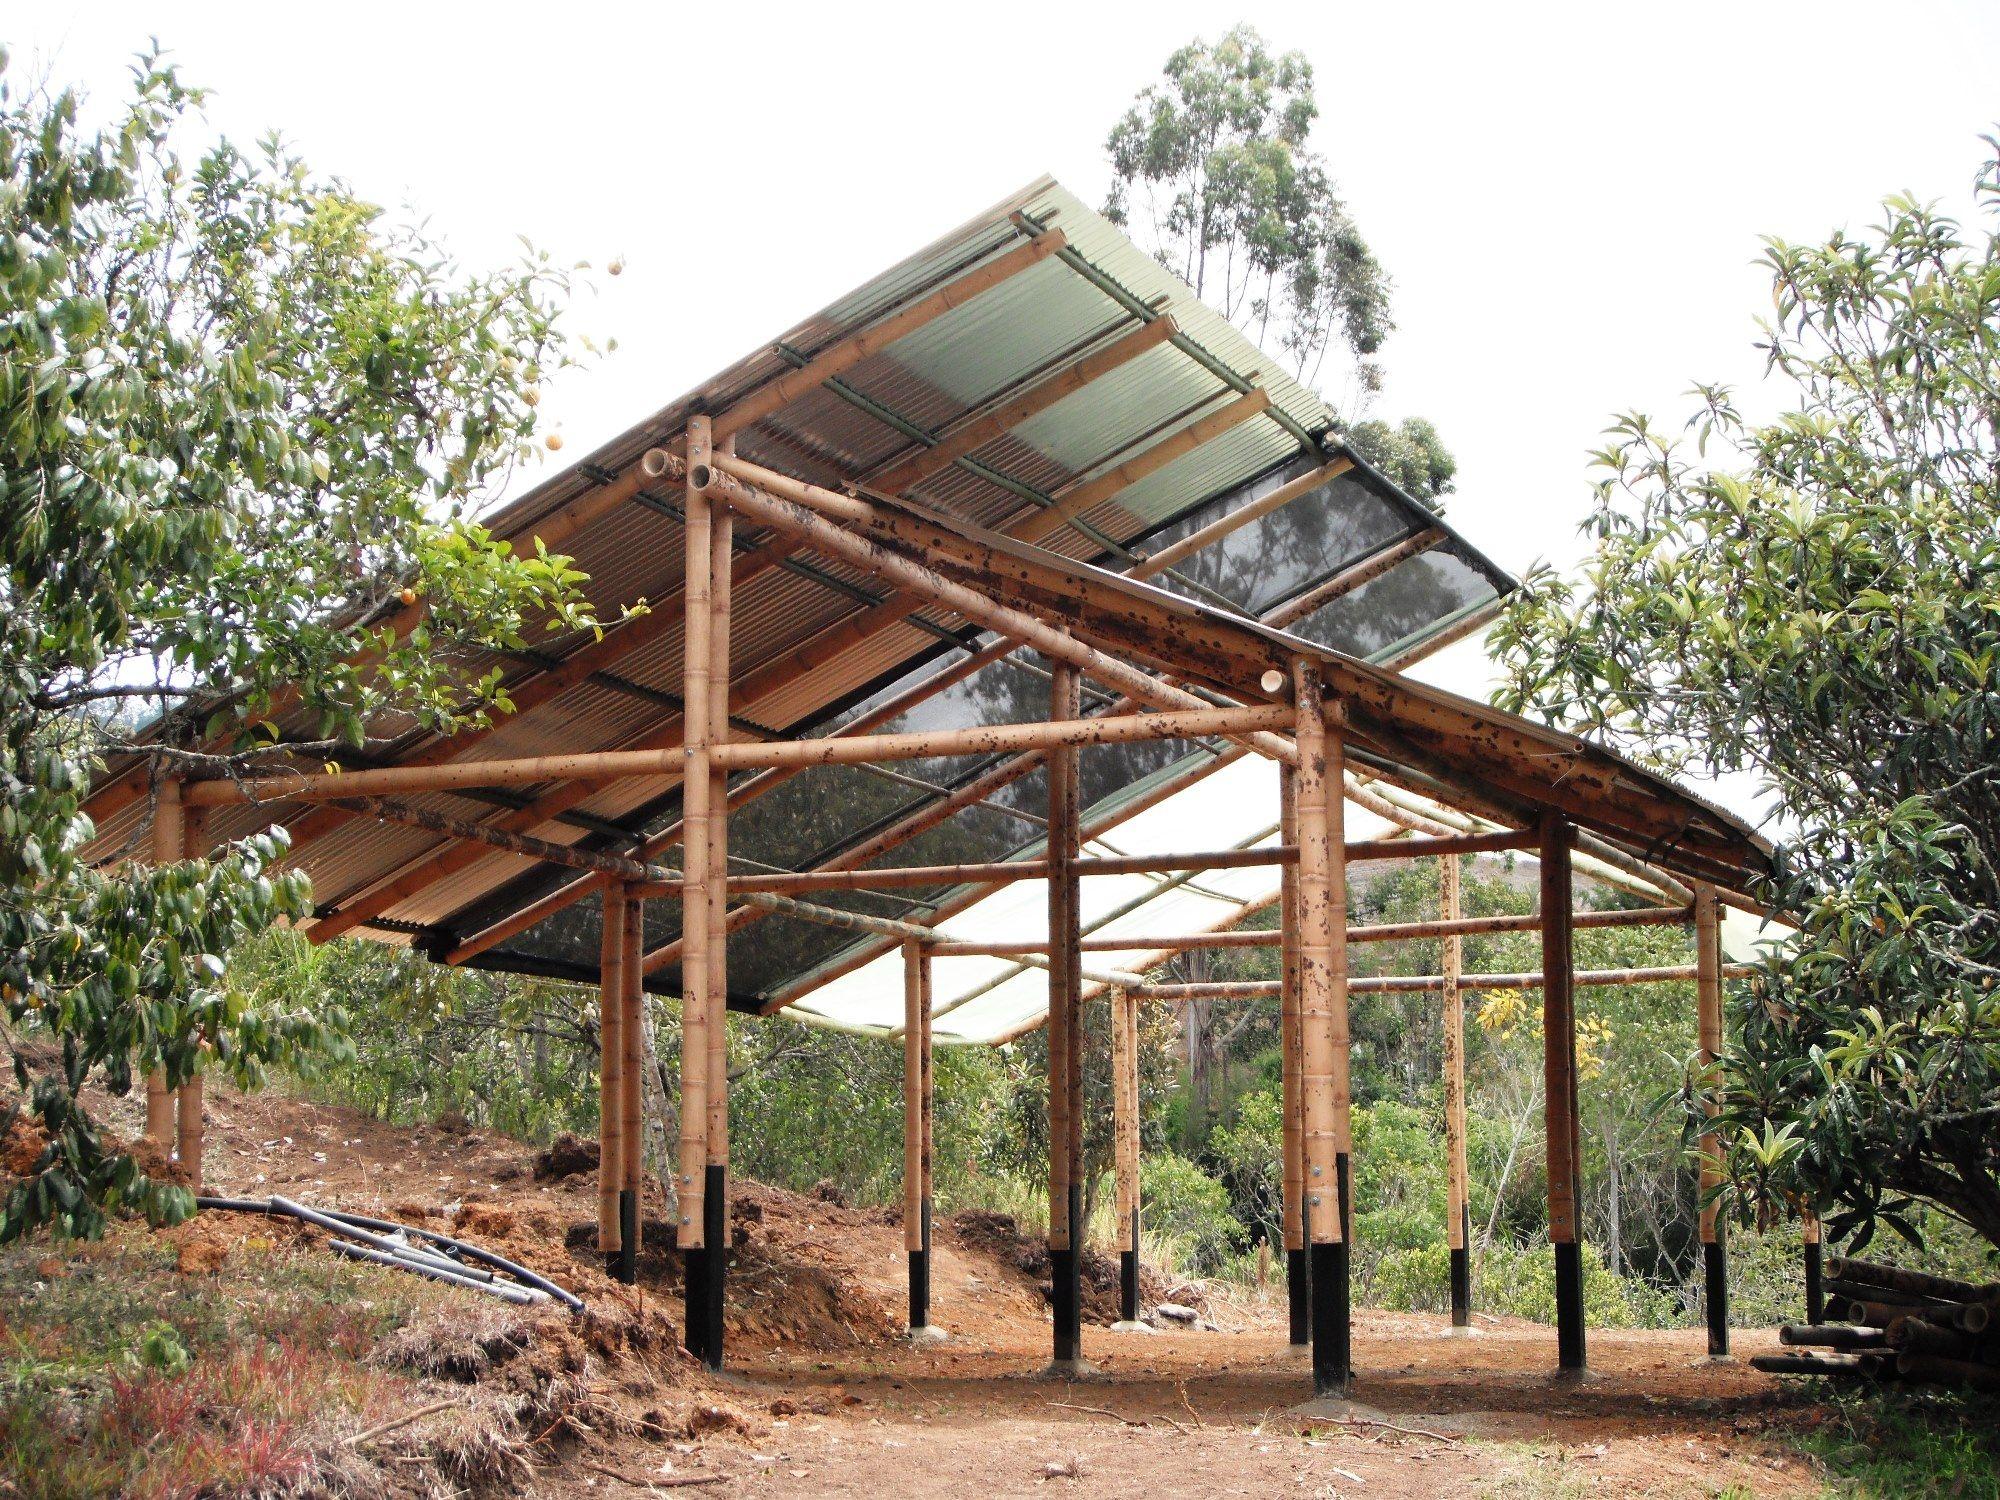 Estructura en bamb guadua para vivero multifuncional for Vivero estructura